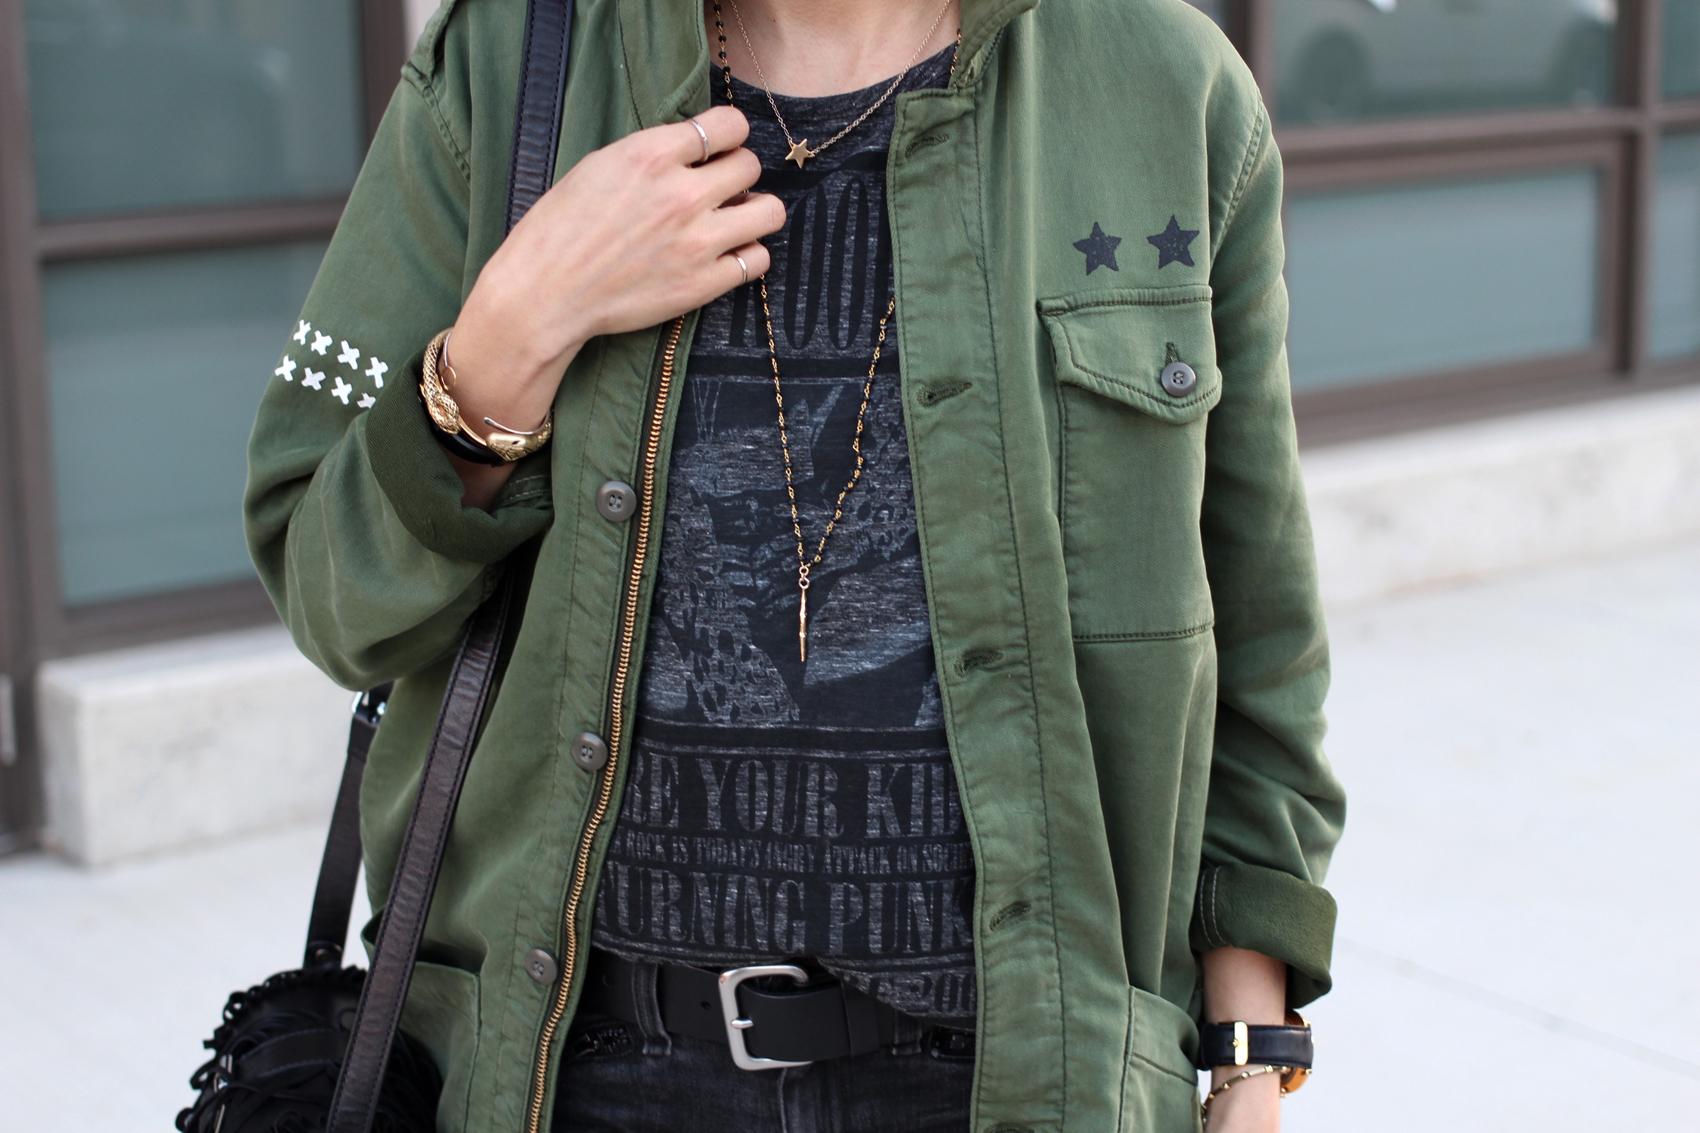 WoahStyle.com-Glam-Grunge-Mother-Denim-utility-jacket-rag-and-bone-distressed-skinny-jeans-Isabel-marant-angie-boots-the-koolples-fringe-bag-tshirt-street-style-toronto-ootd_7389.jpg